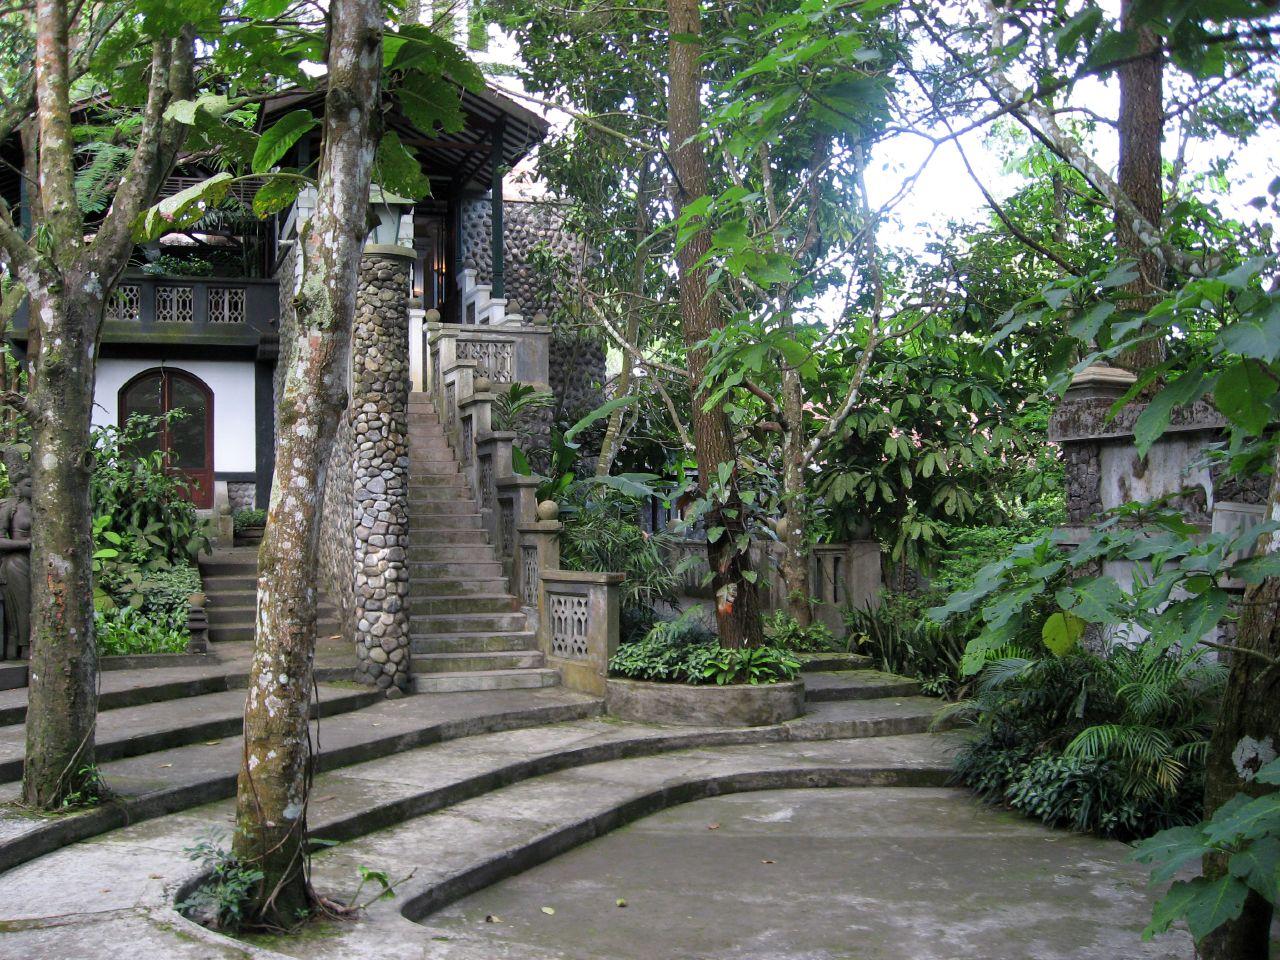 Javanese Garden at Beukenhof